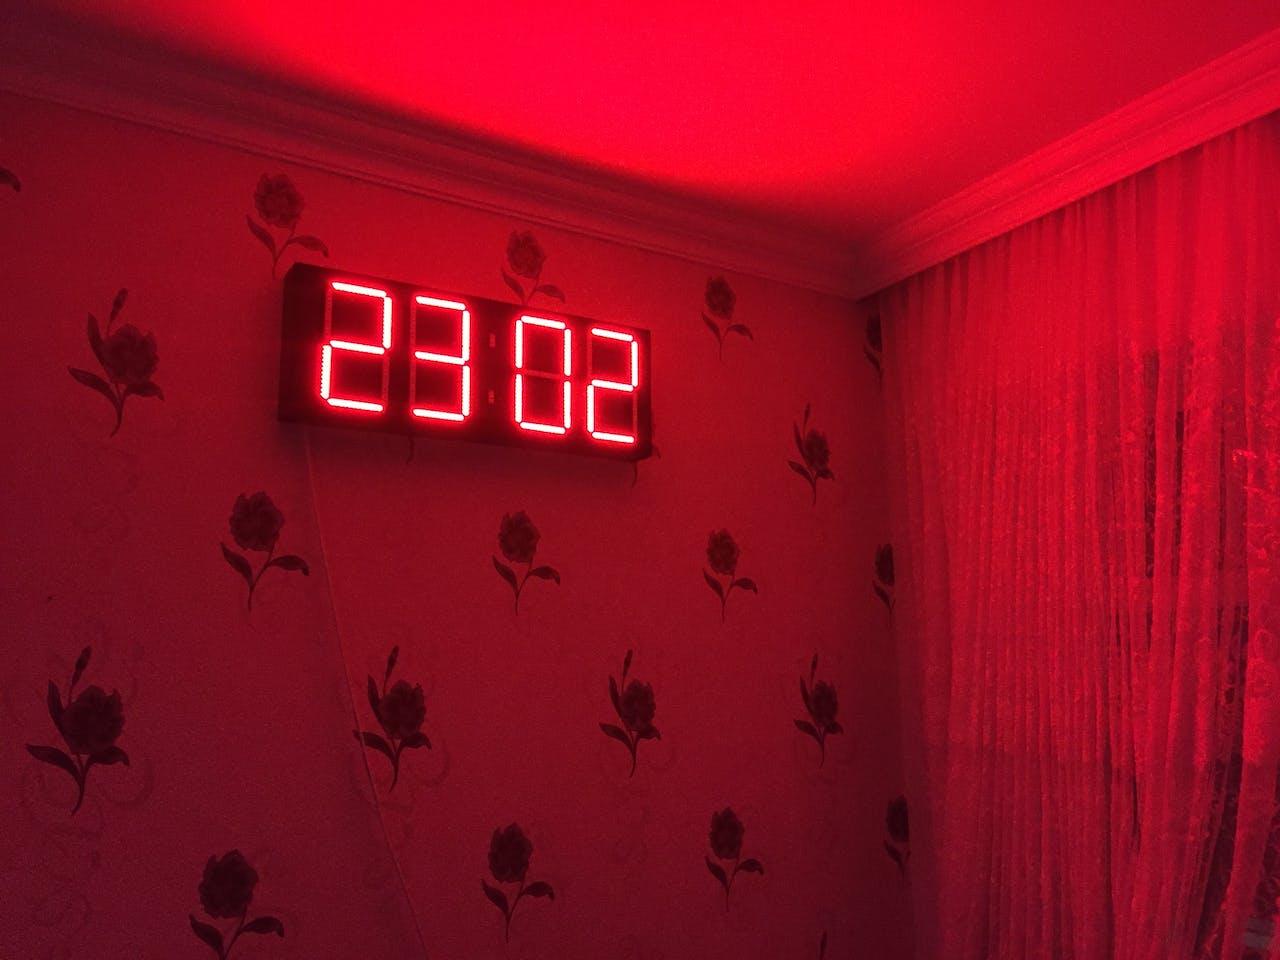 Digital Wall Clock - Hackster io